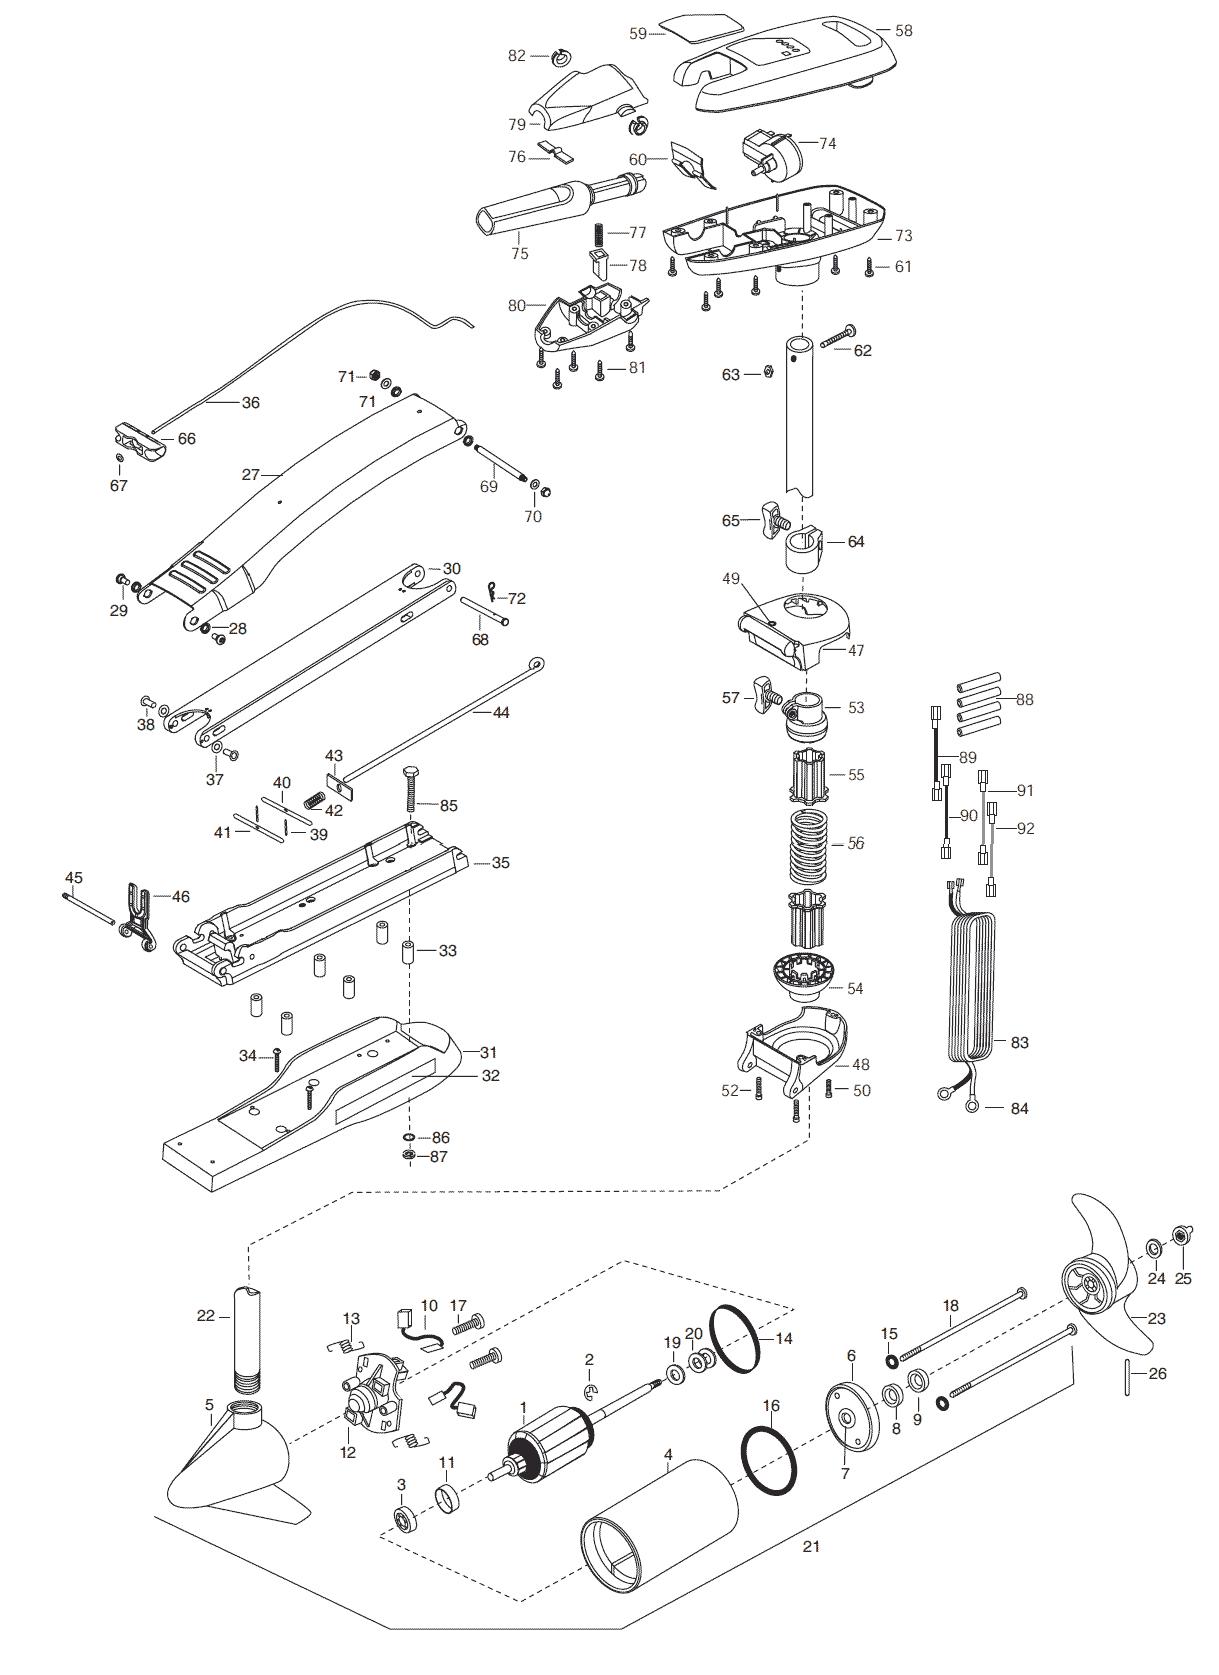 minn kota riptide 55 wiring diagram directed electronics diagrams sc b 52 inch parts 2003 from